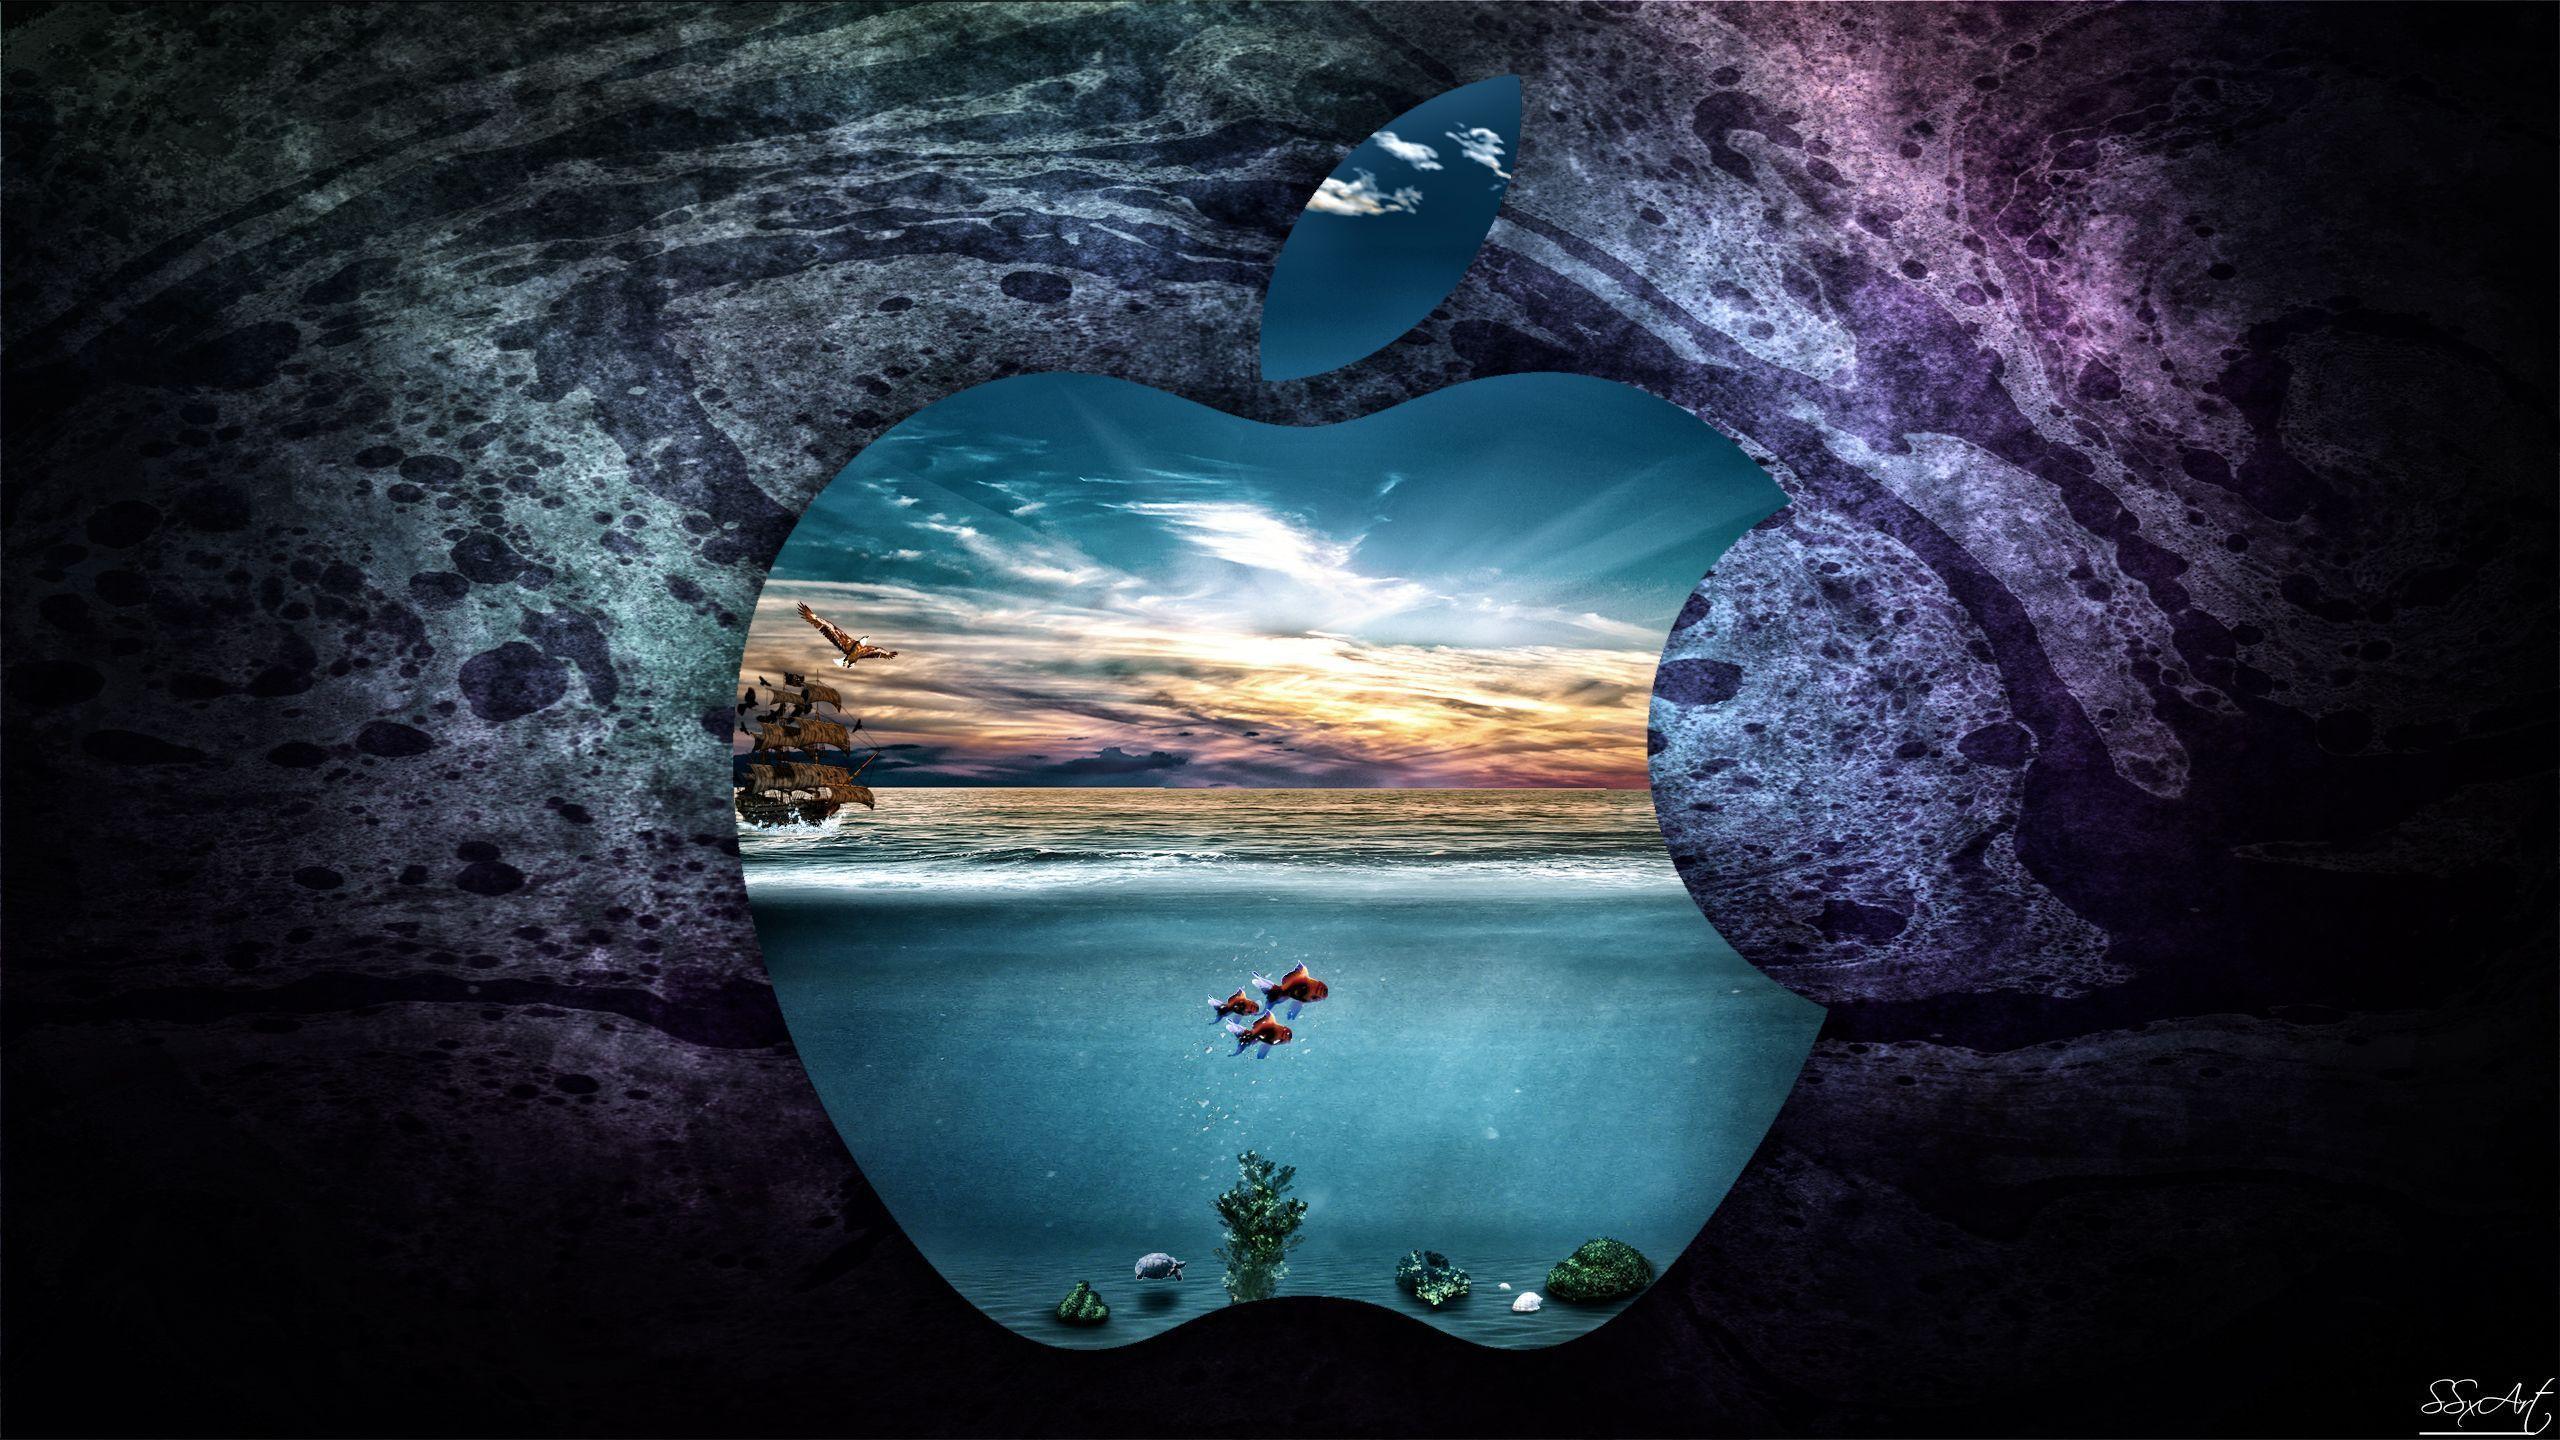 Imac Desktop Wallpaper Sfondi Per Macbook Air 13 2560x1440 Wallpaper Teahub Io